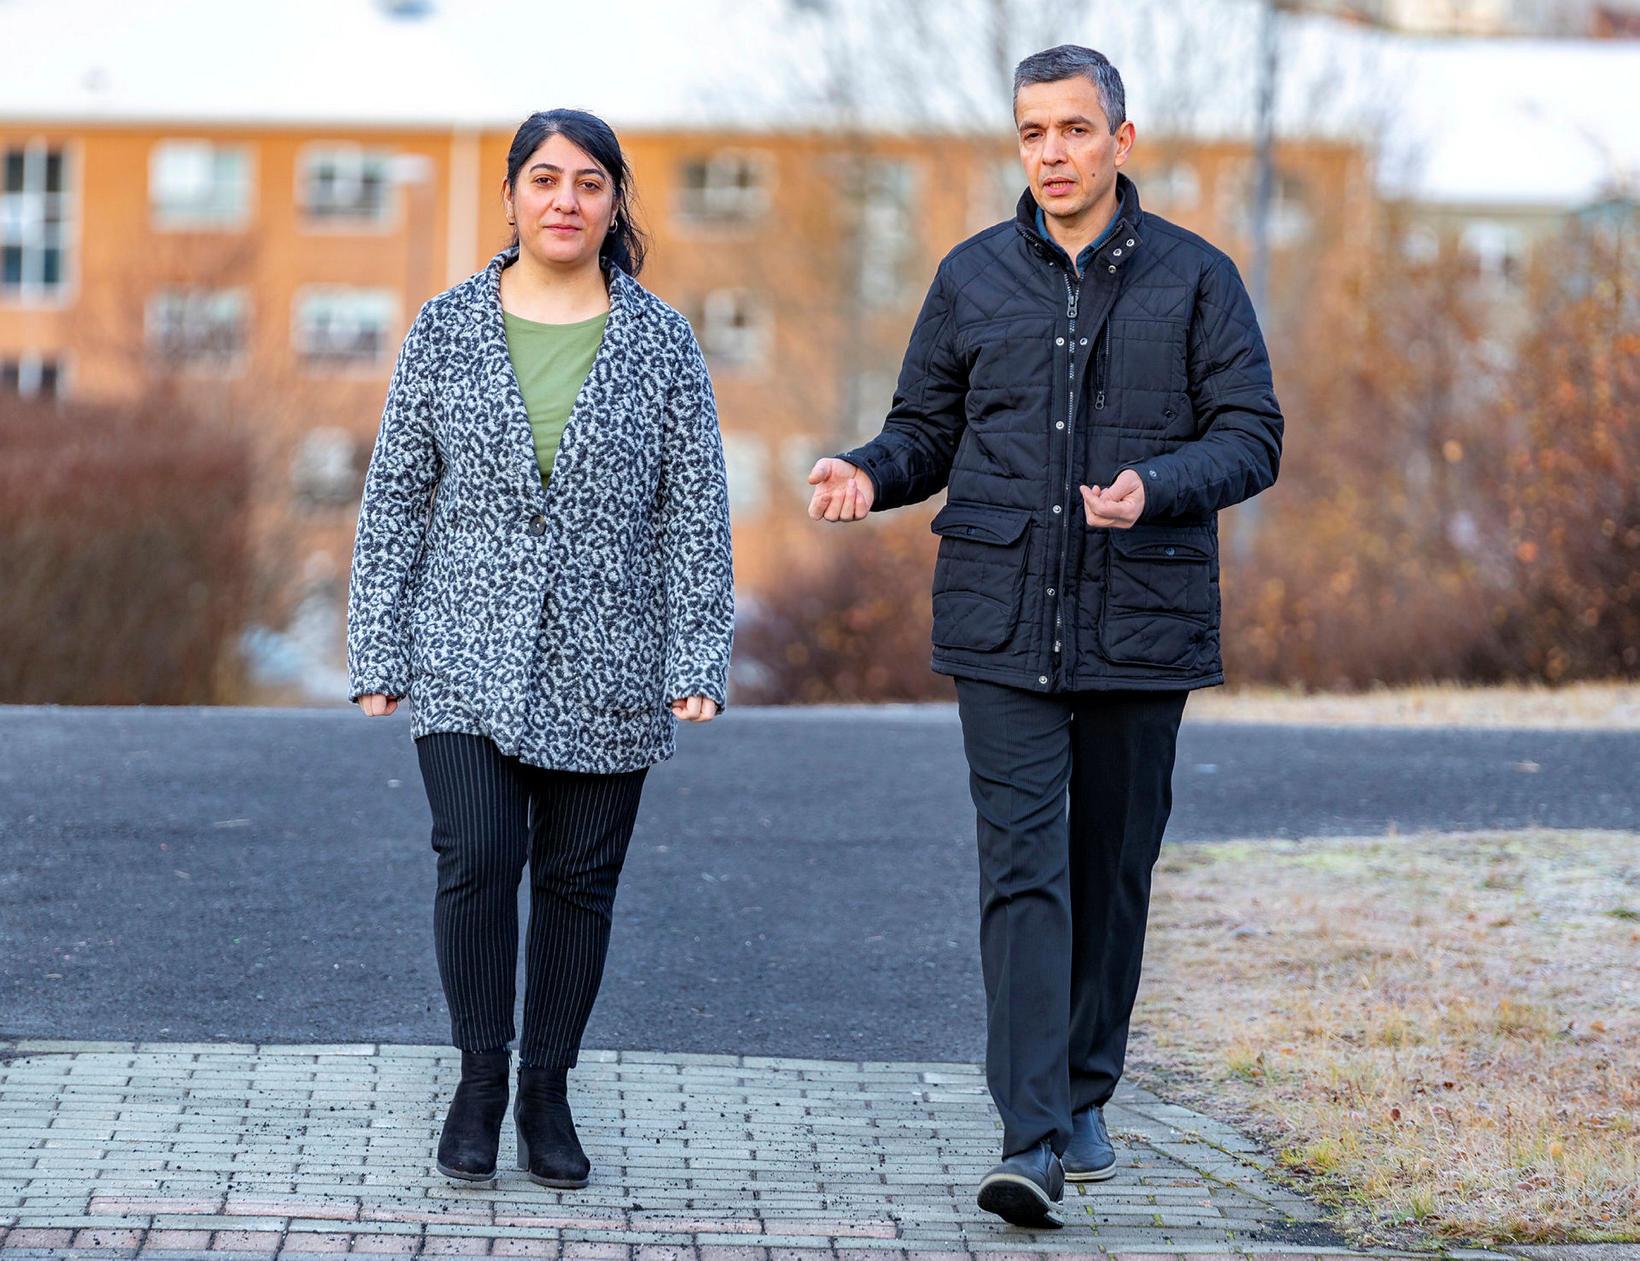 Susan Rafik Hama og Salah Karim Mahmood eru Kúrdar frá ...